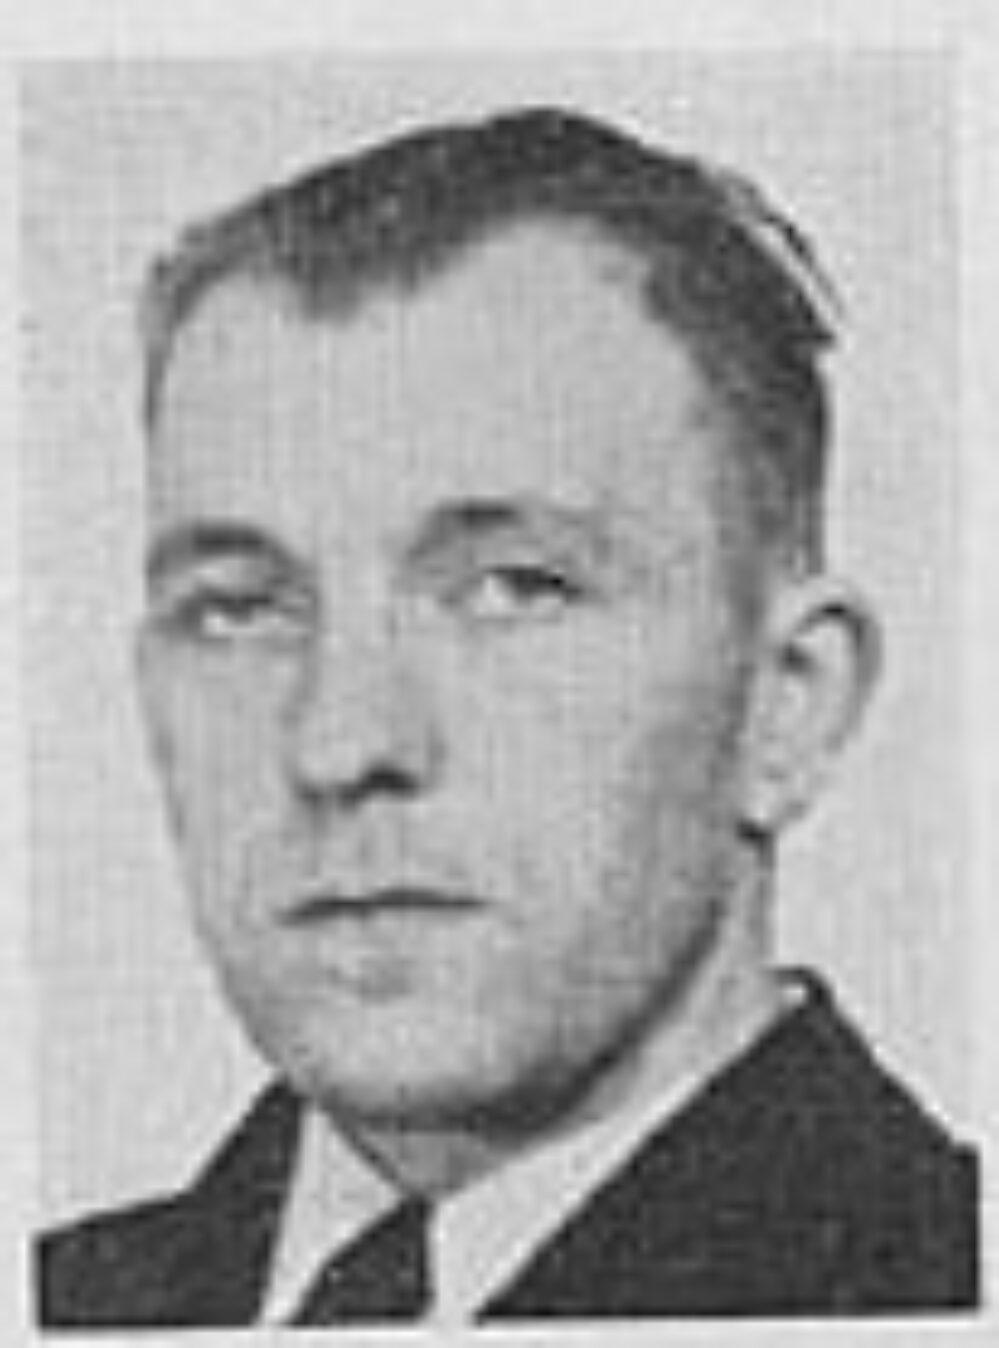 Harald August Sande